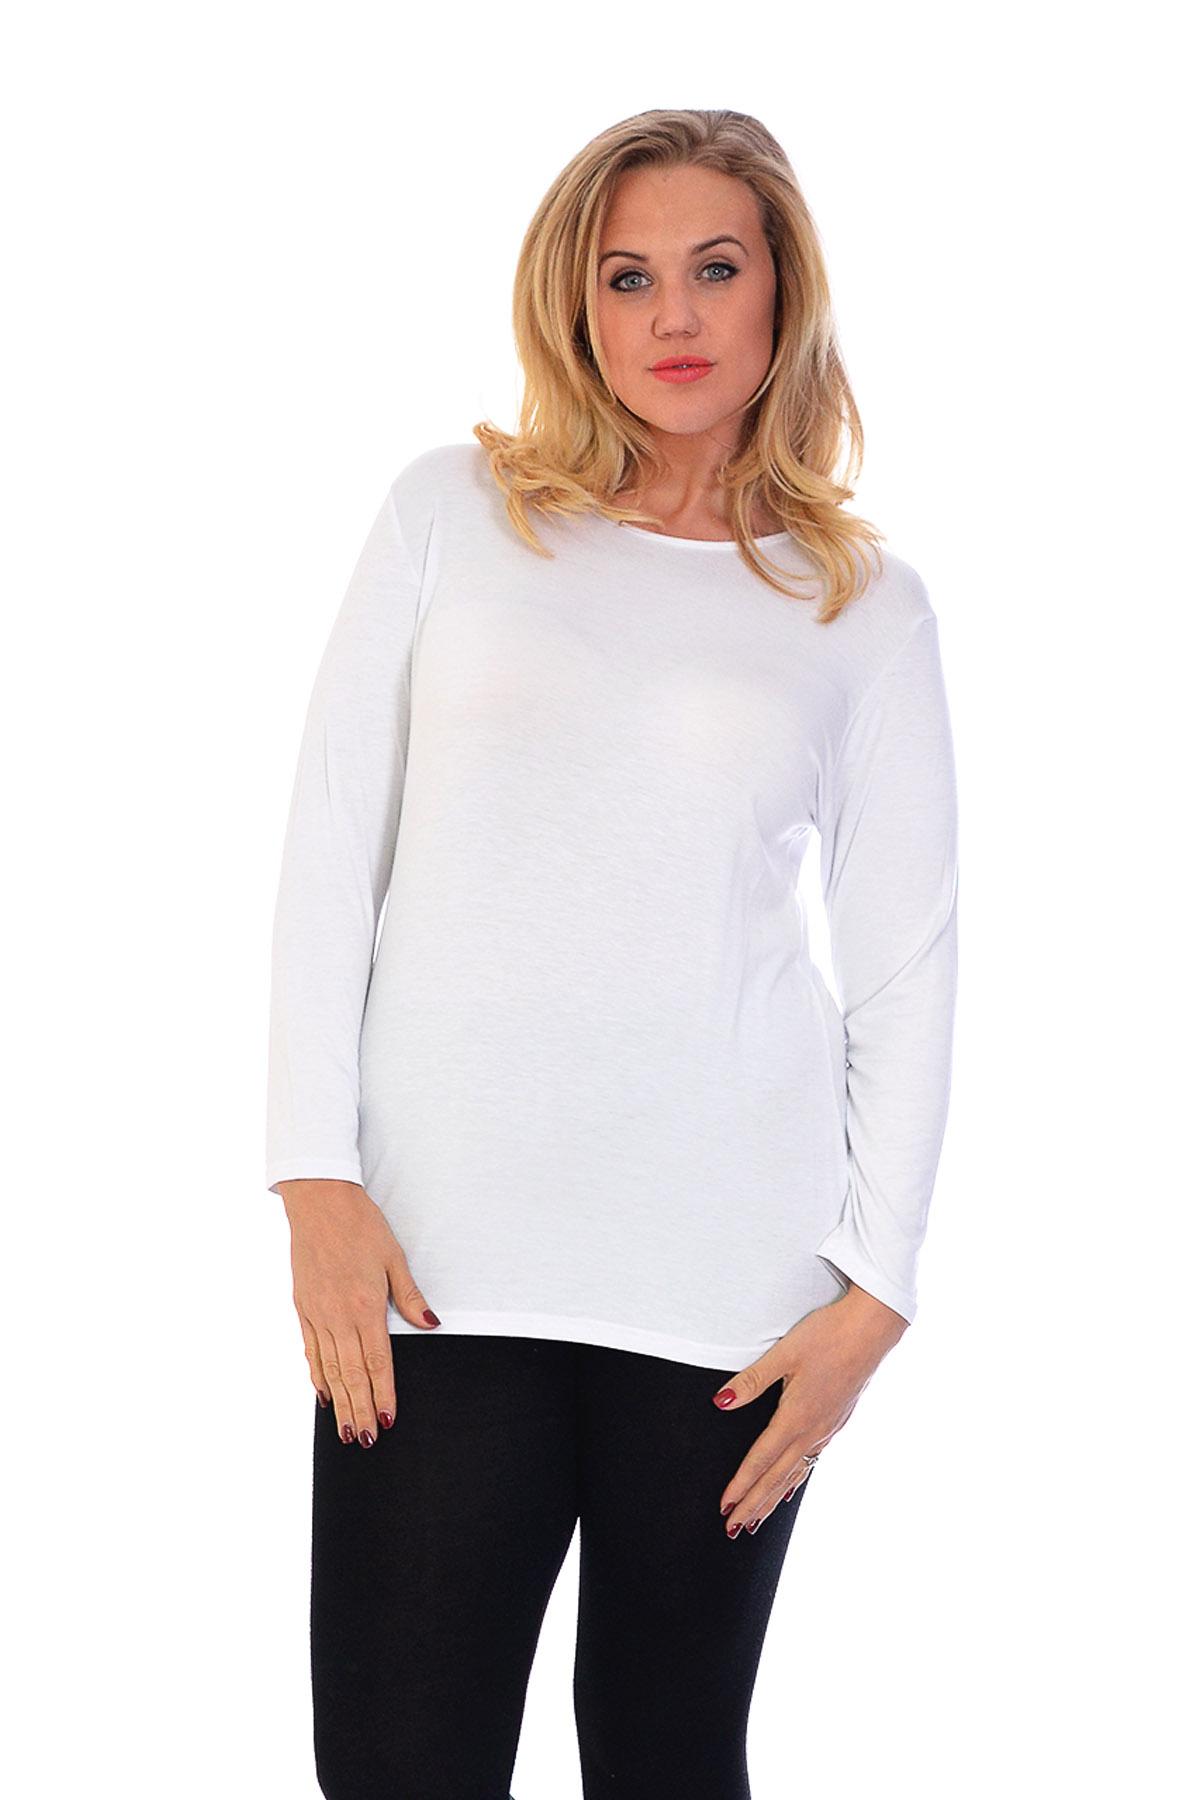 New ladies t shirt womens top plain long sleeve basic plus for Basic shirts for women